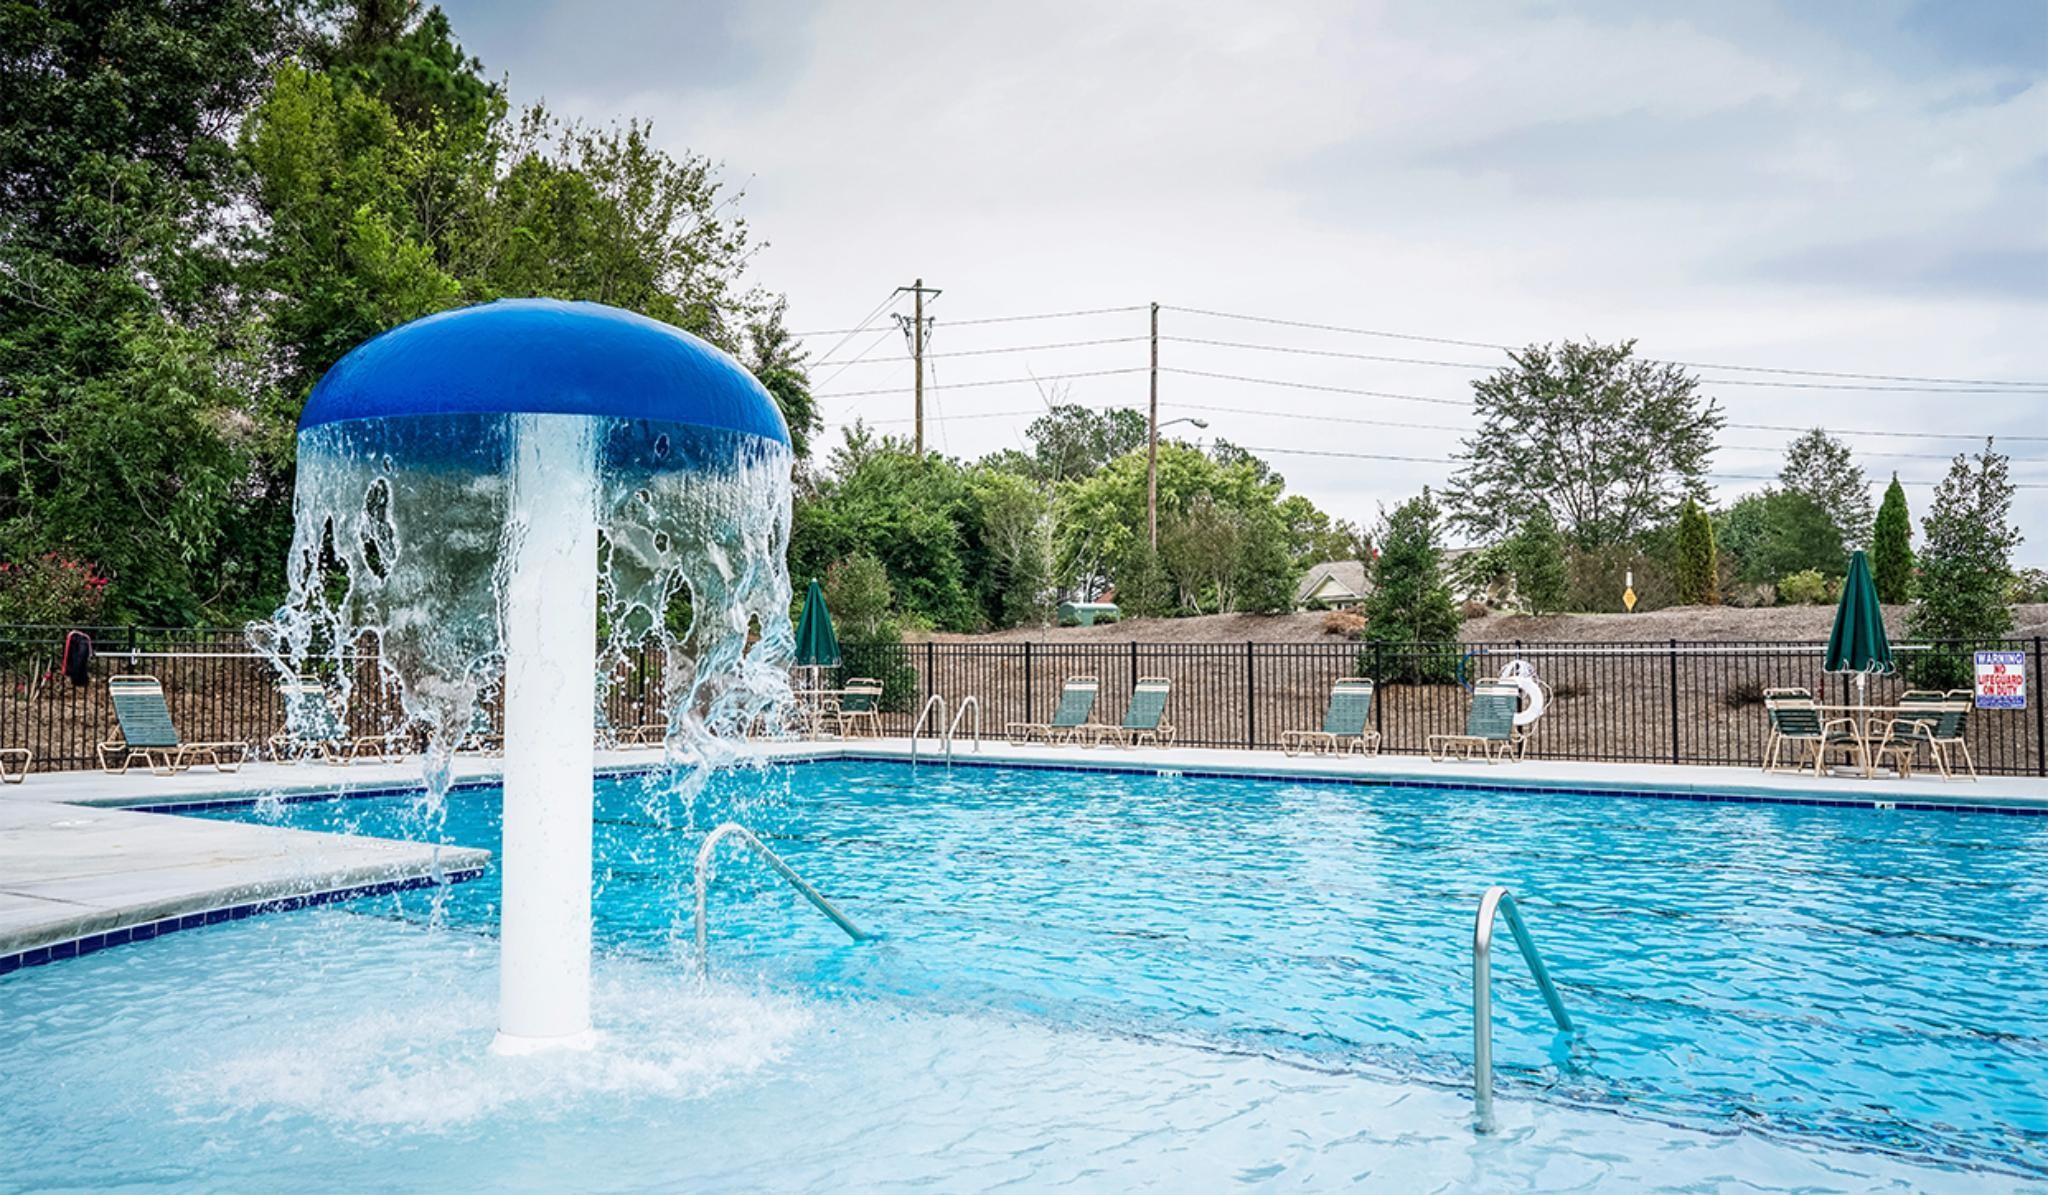 Bristol Community Pool with Kids Fountain, Sun pat